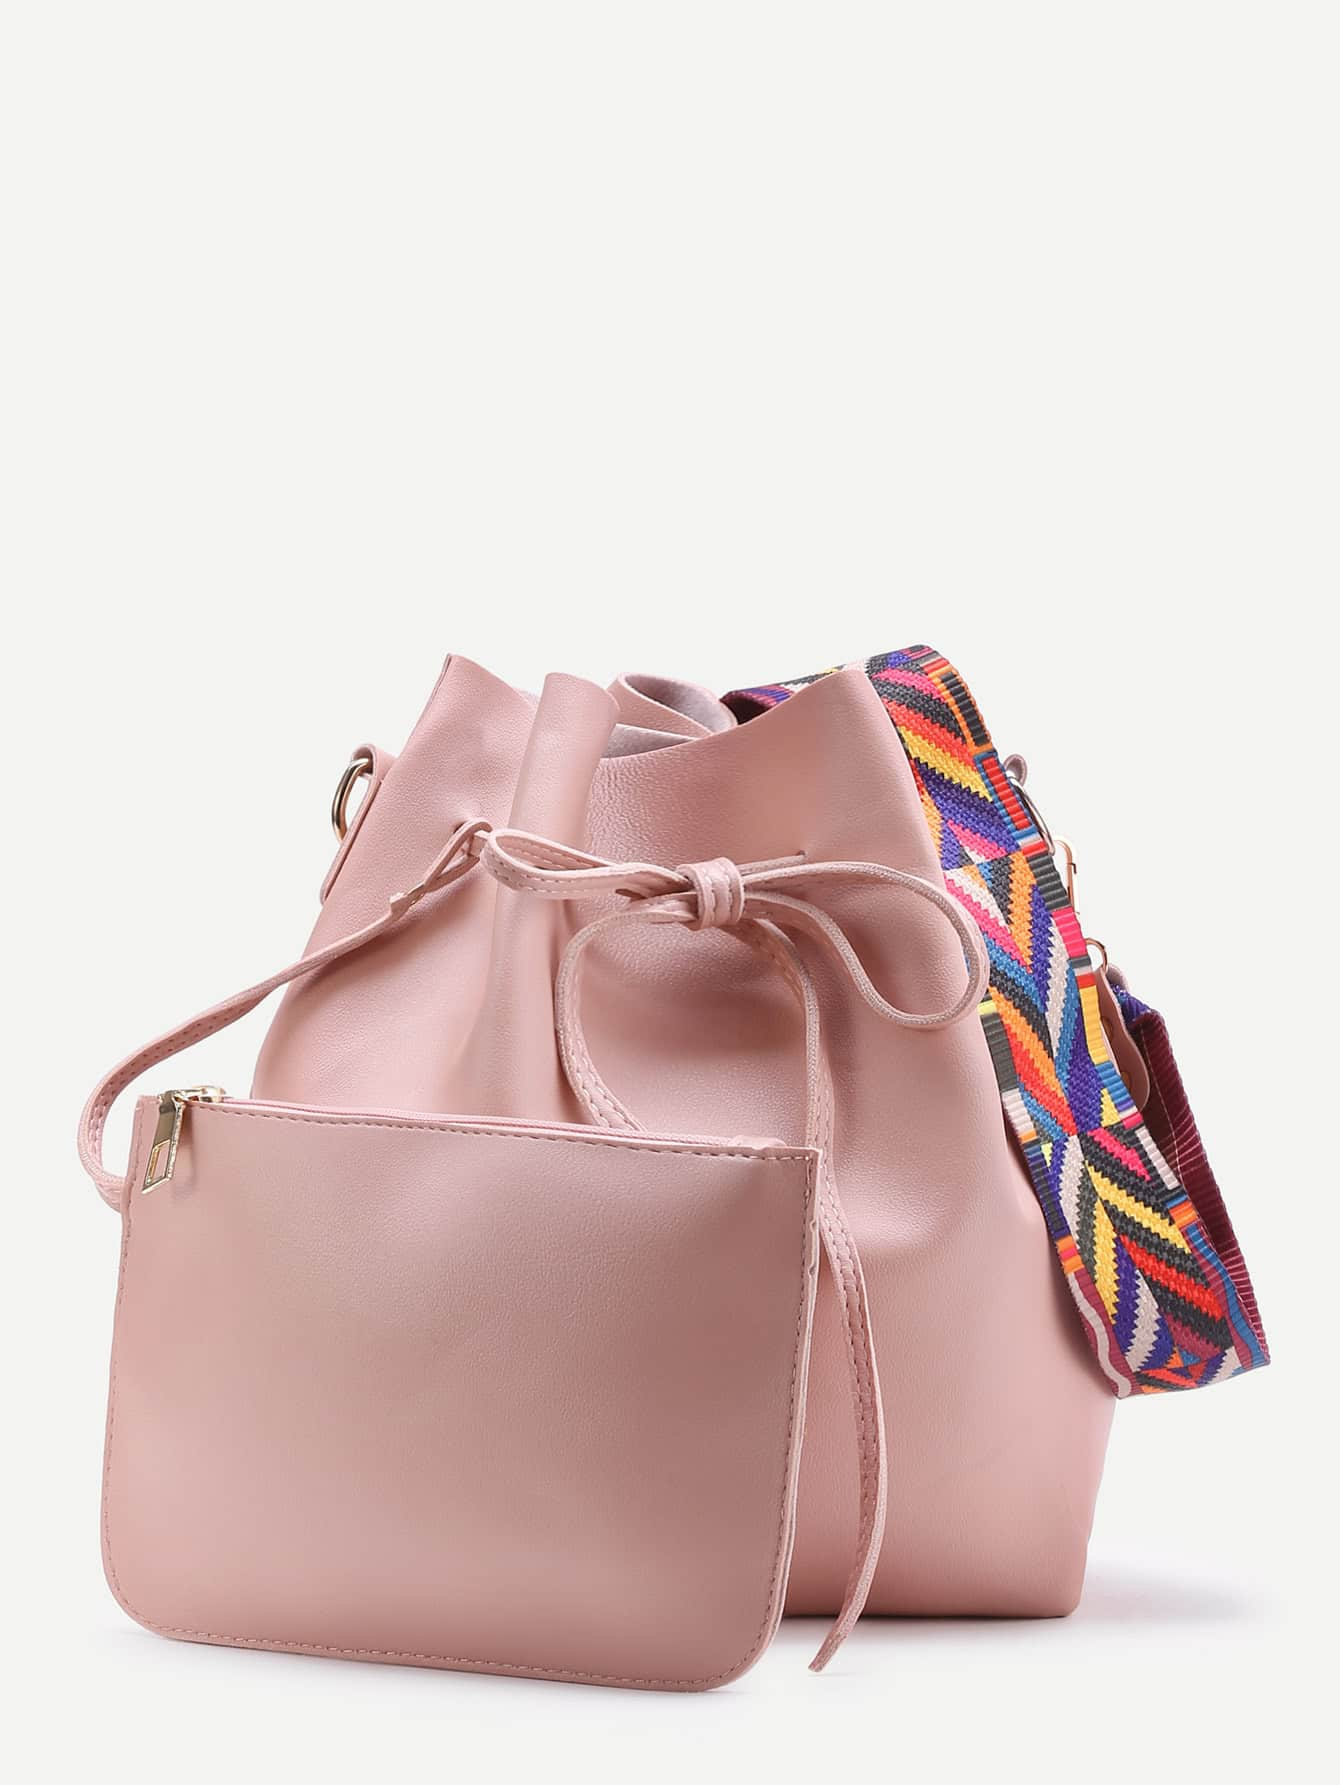 bag170505302_1